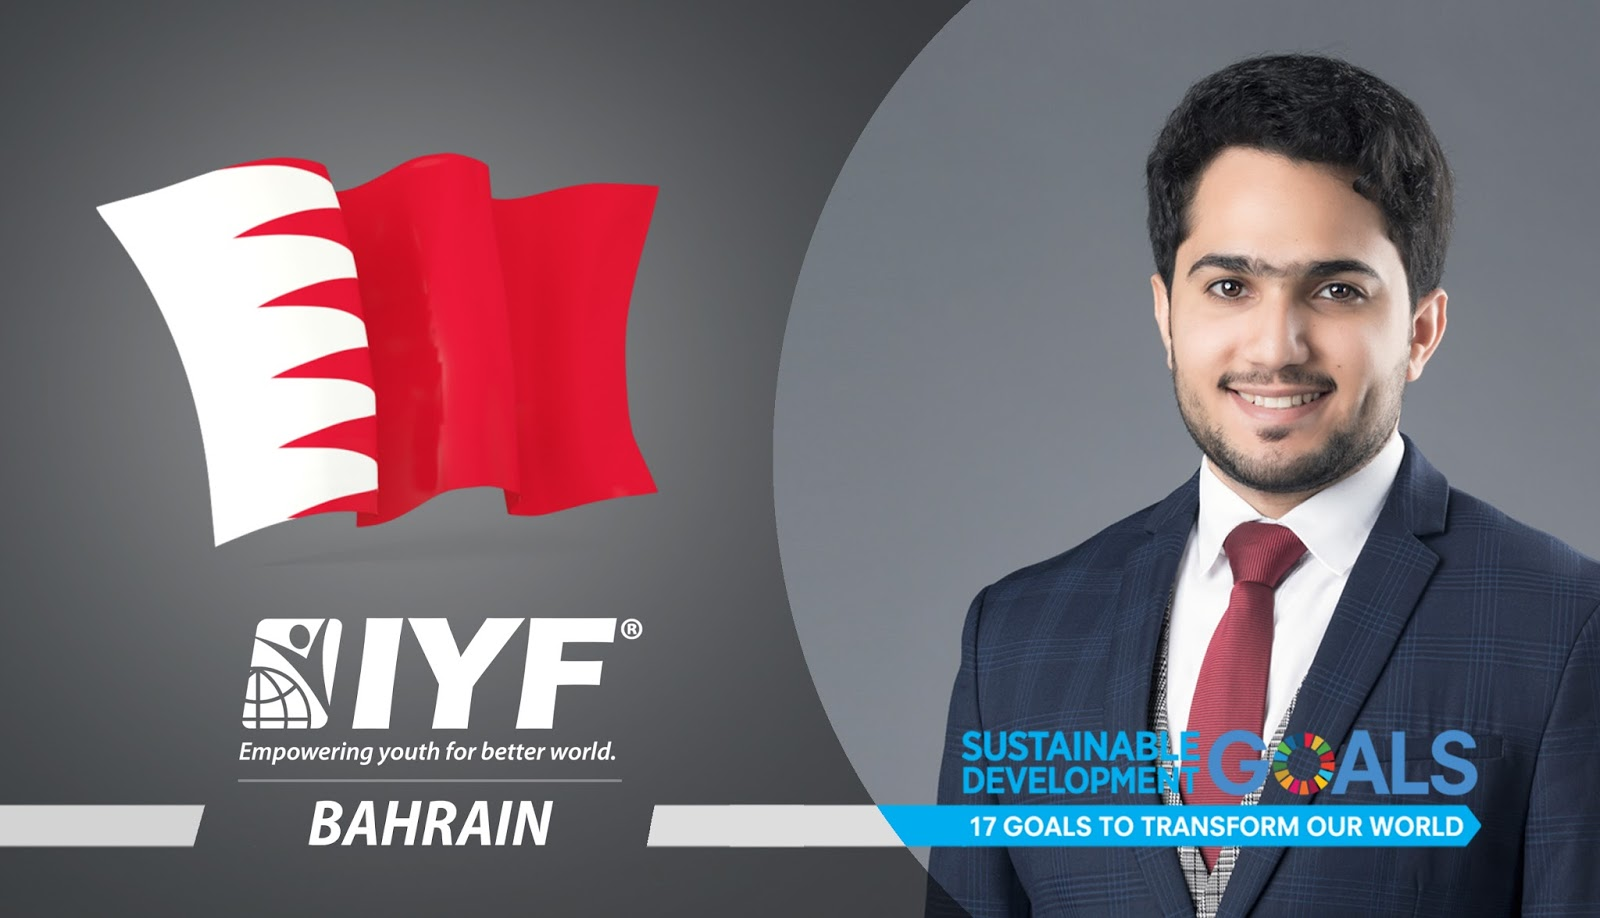 Abdulaziz Alsebaie, IYF Representative in Bahrain